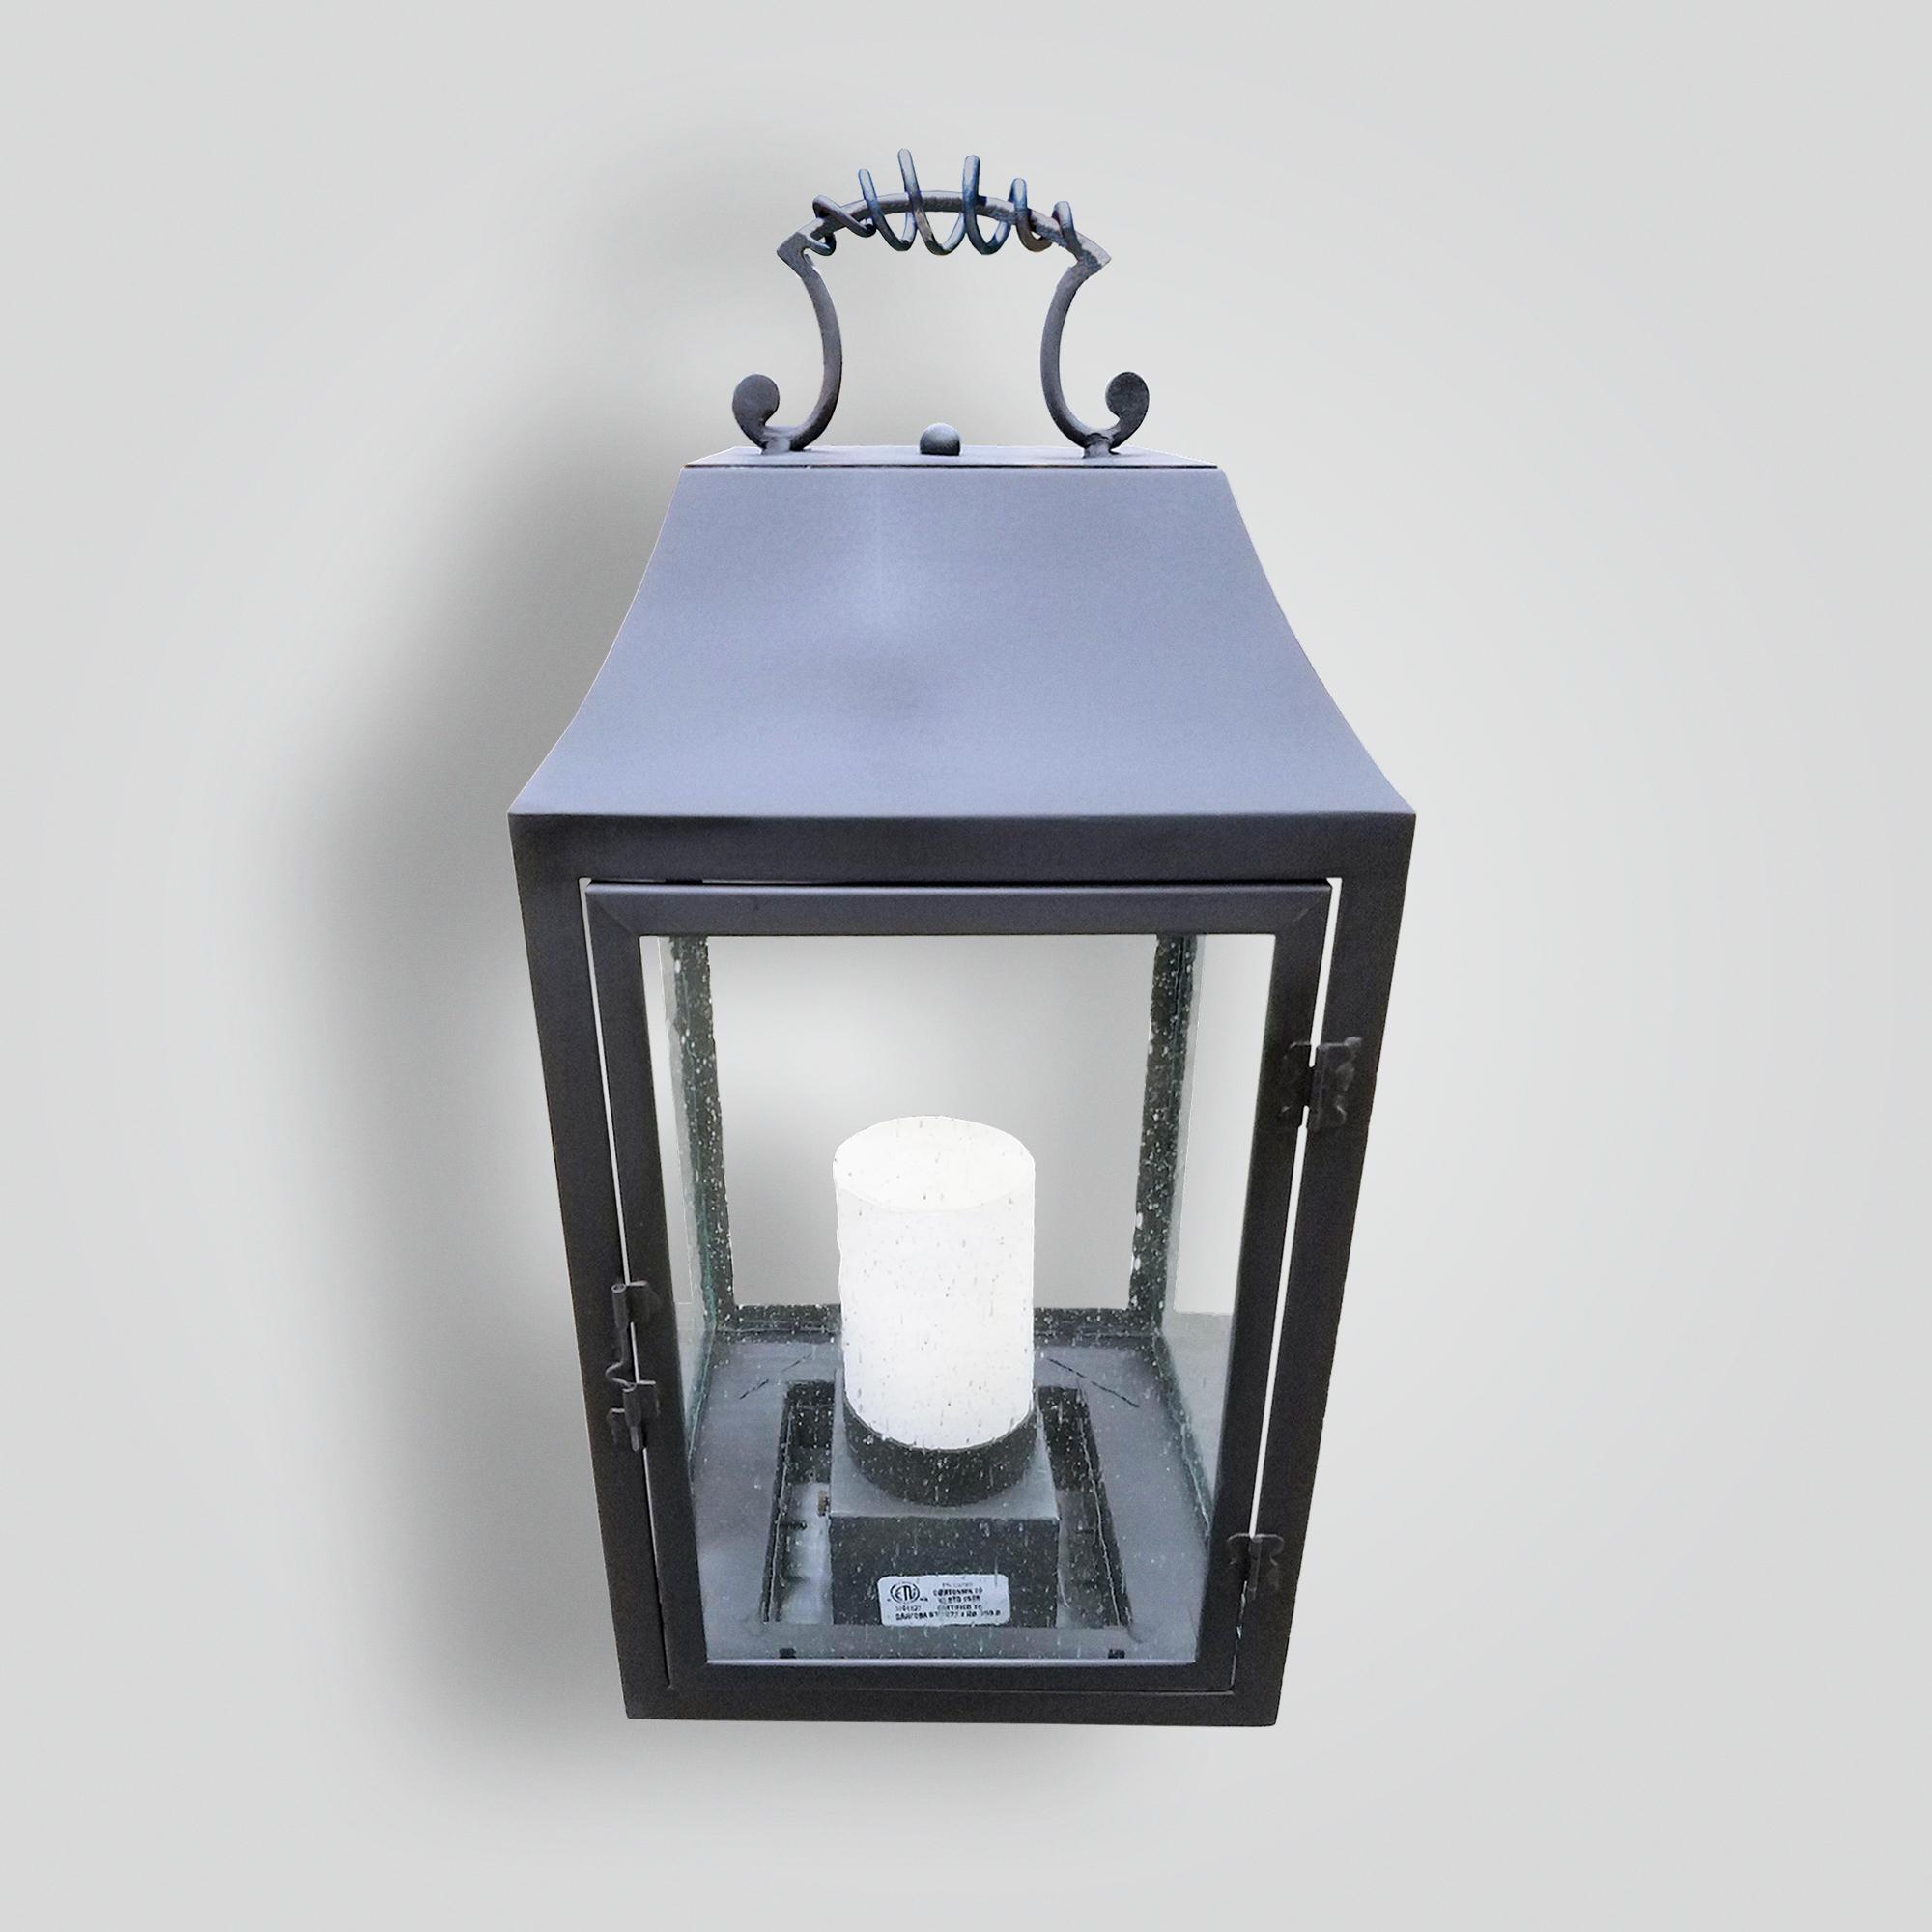 282 – ADG Lighting Collection